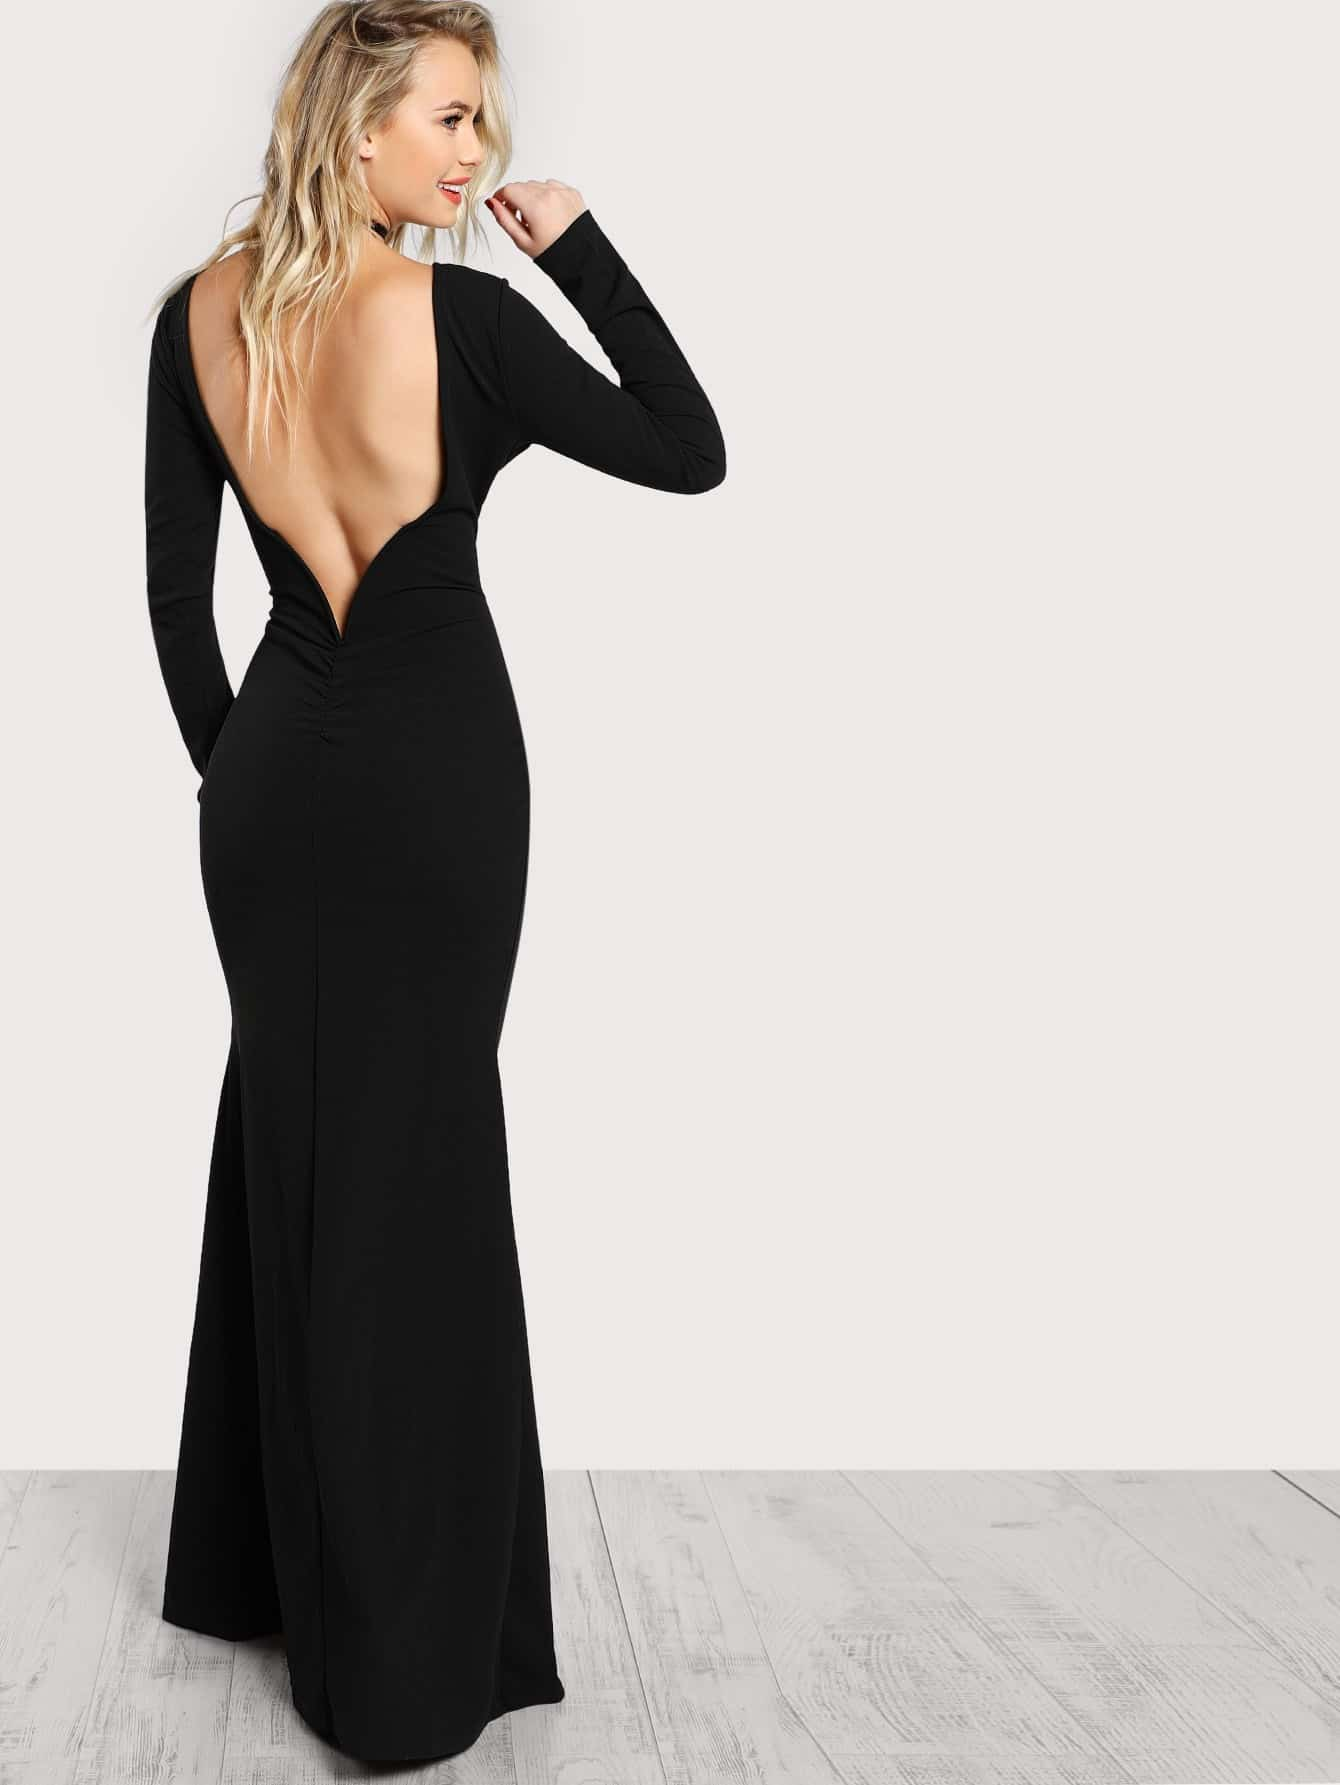 Long Sleeve Open Back Bodycon Maxi Dress open back chain detail bodycon dress